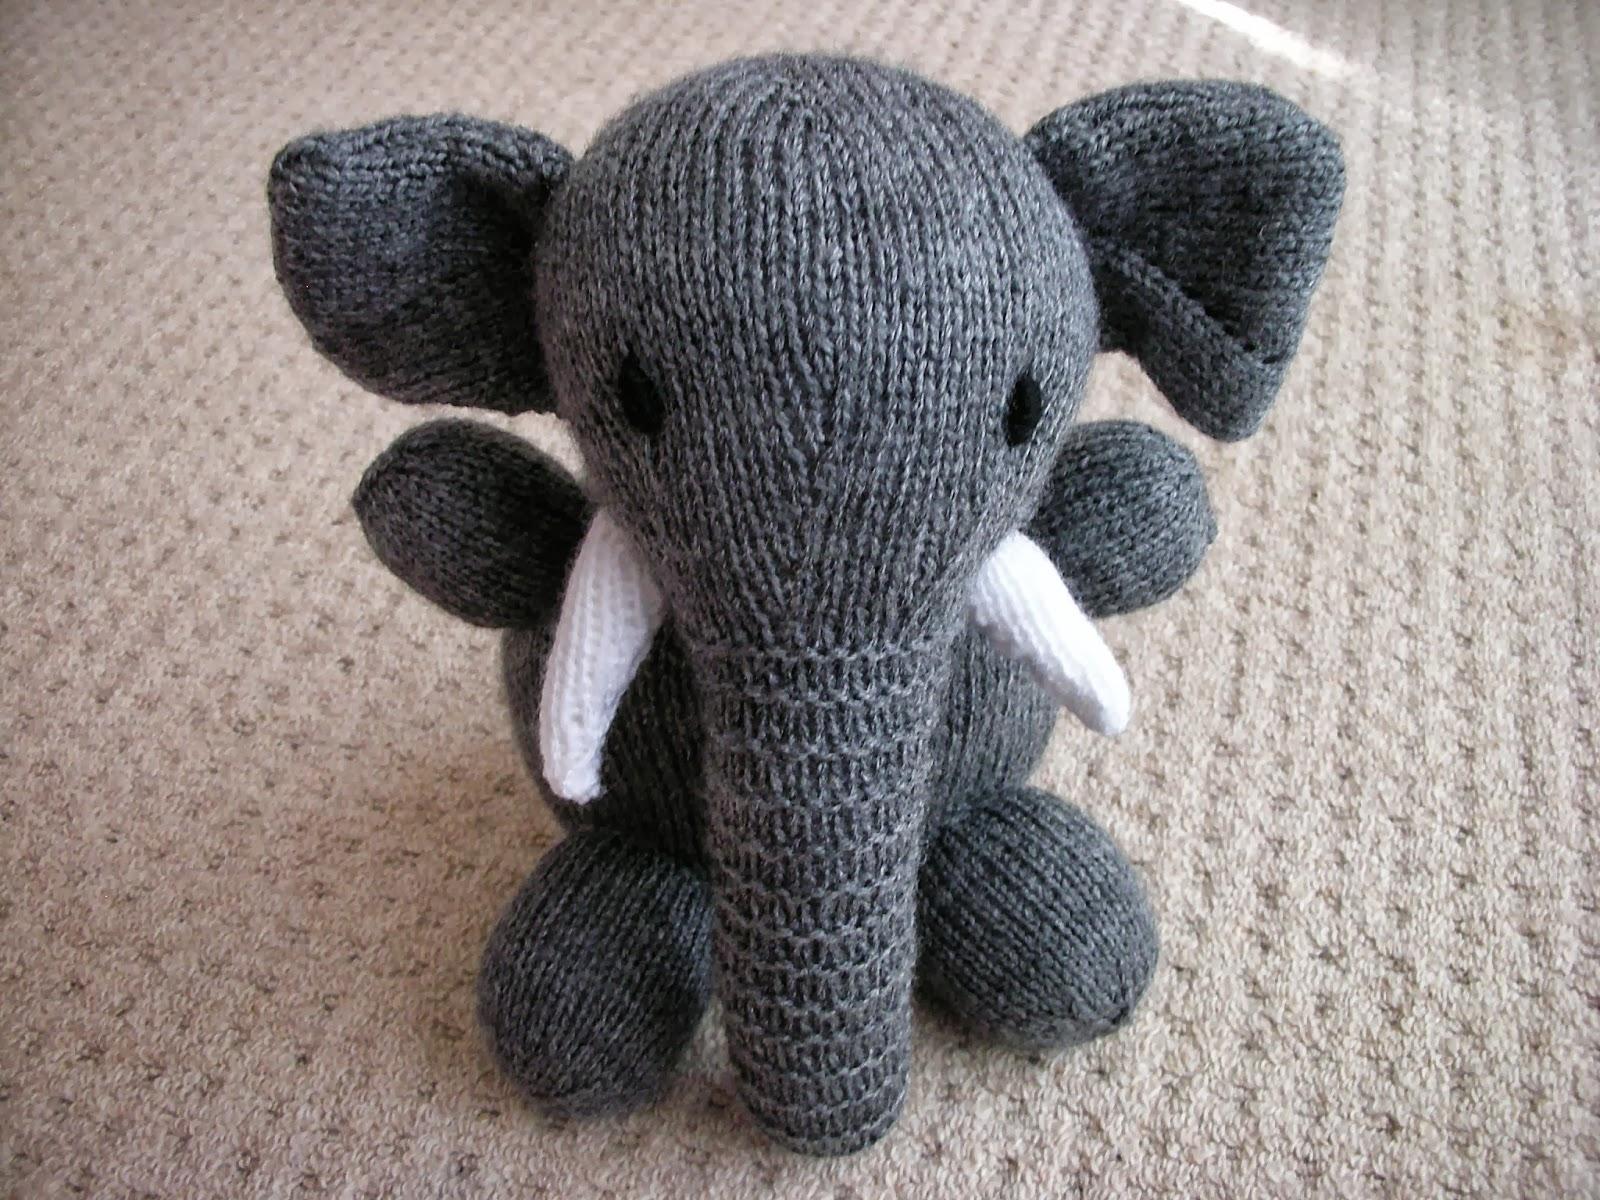 Luxury Knitting Patterns For Elephants Gallery - Blanket Knitting ...